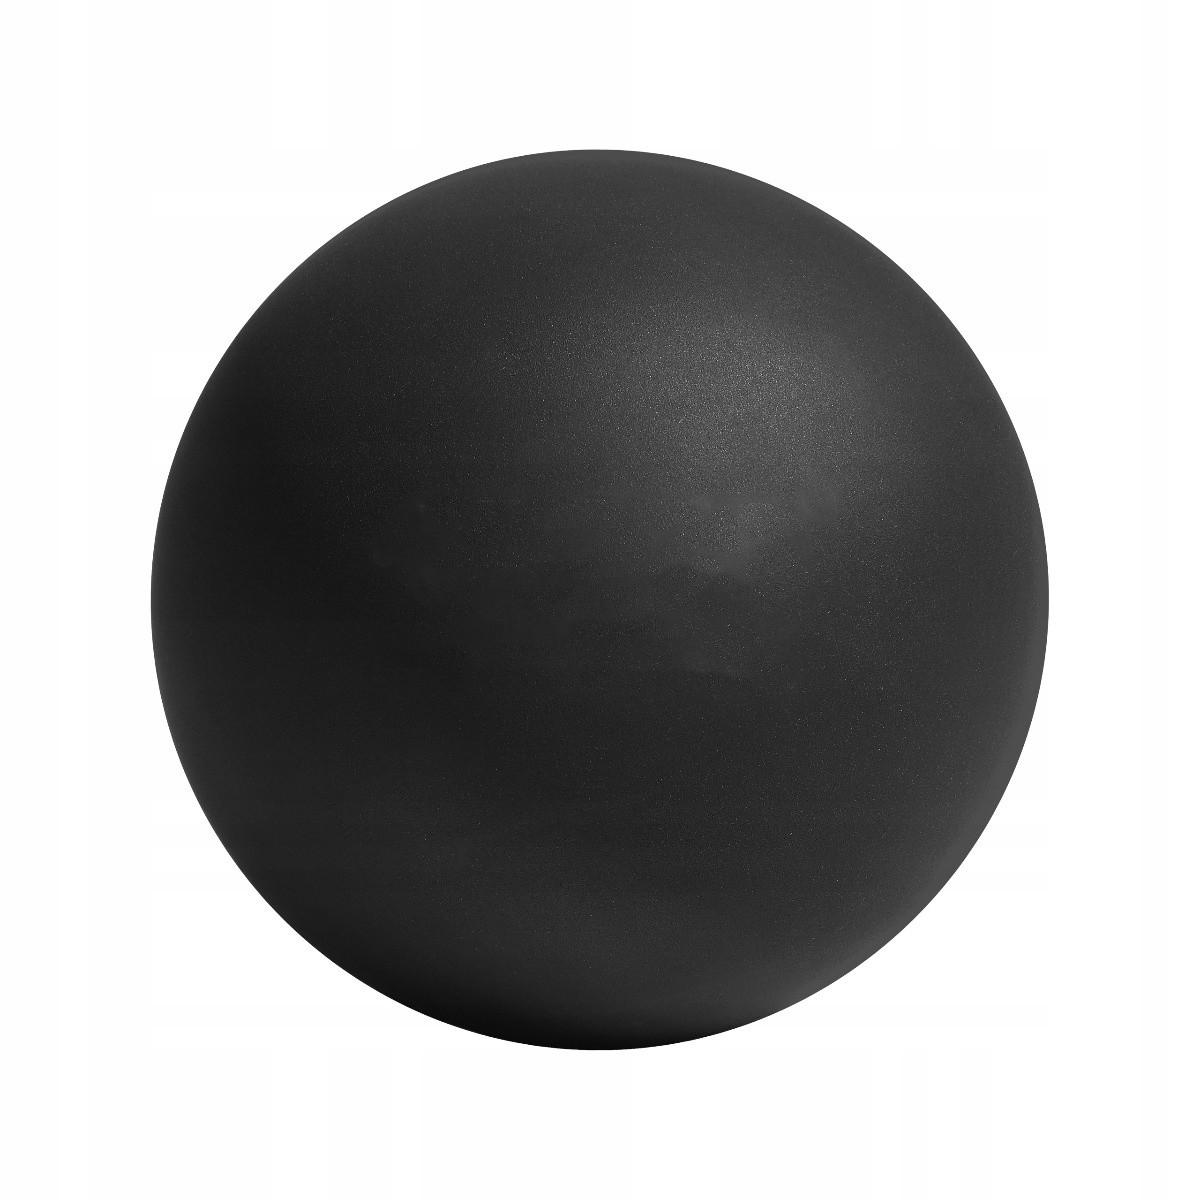 Masážna gulička lopta guľa Lacrosse Ball čierna megamix.sk